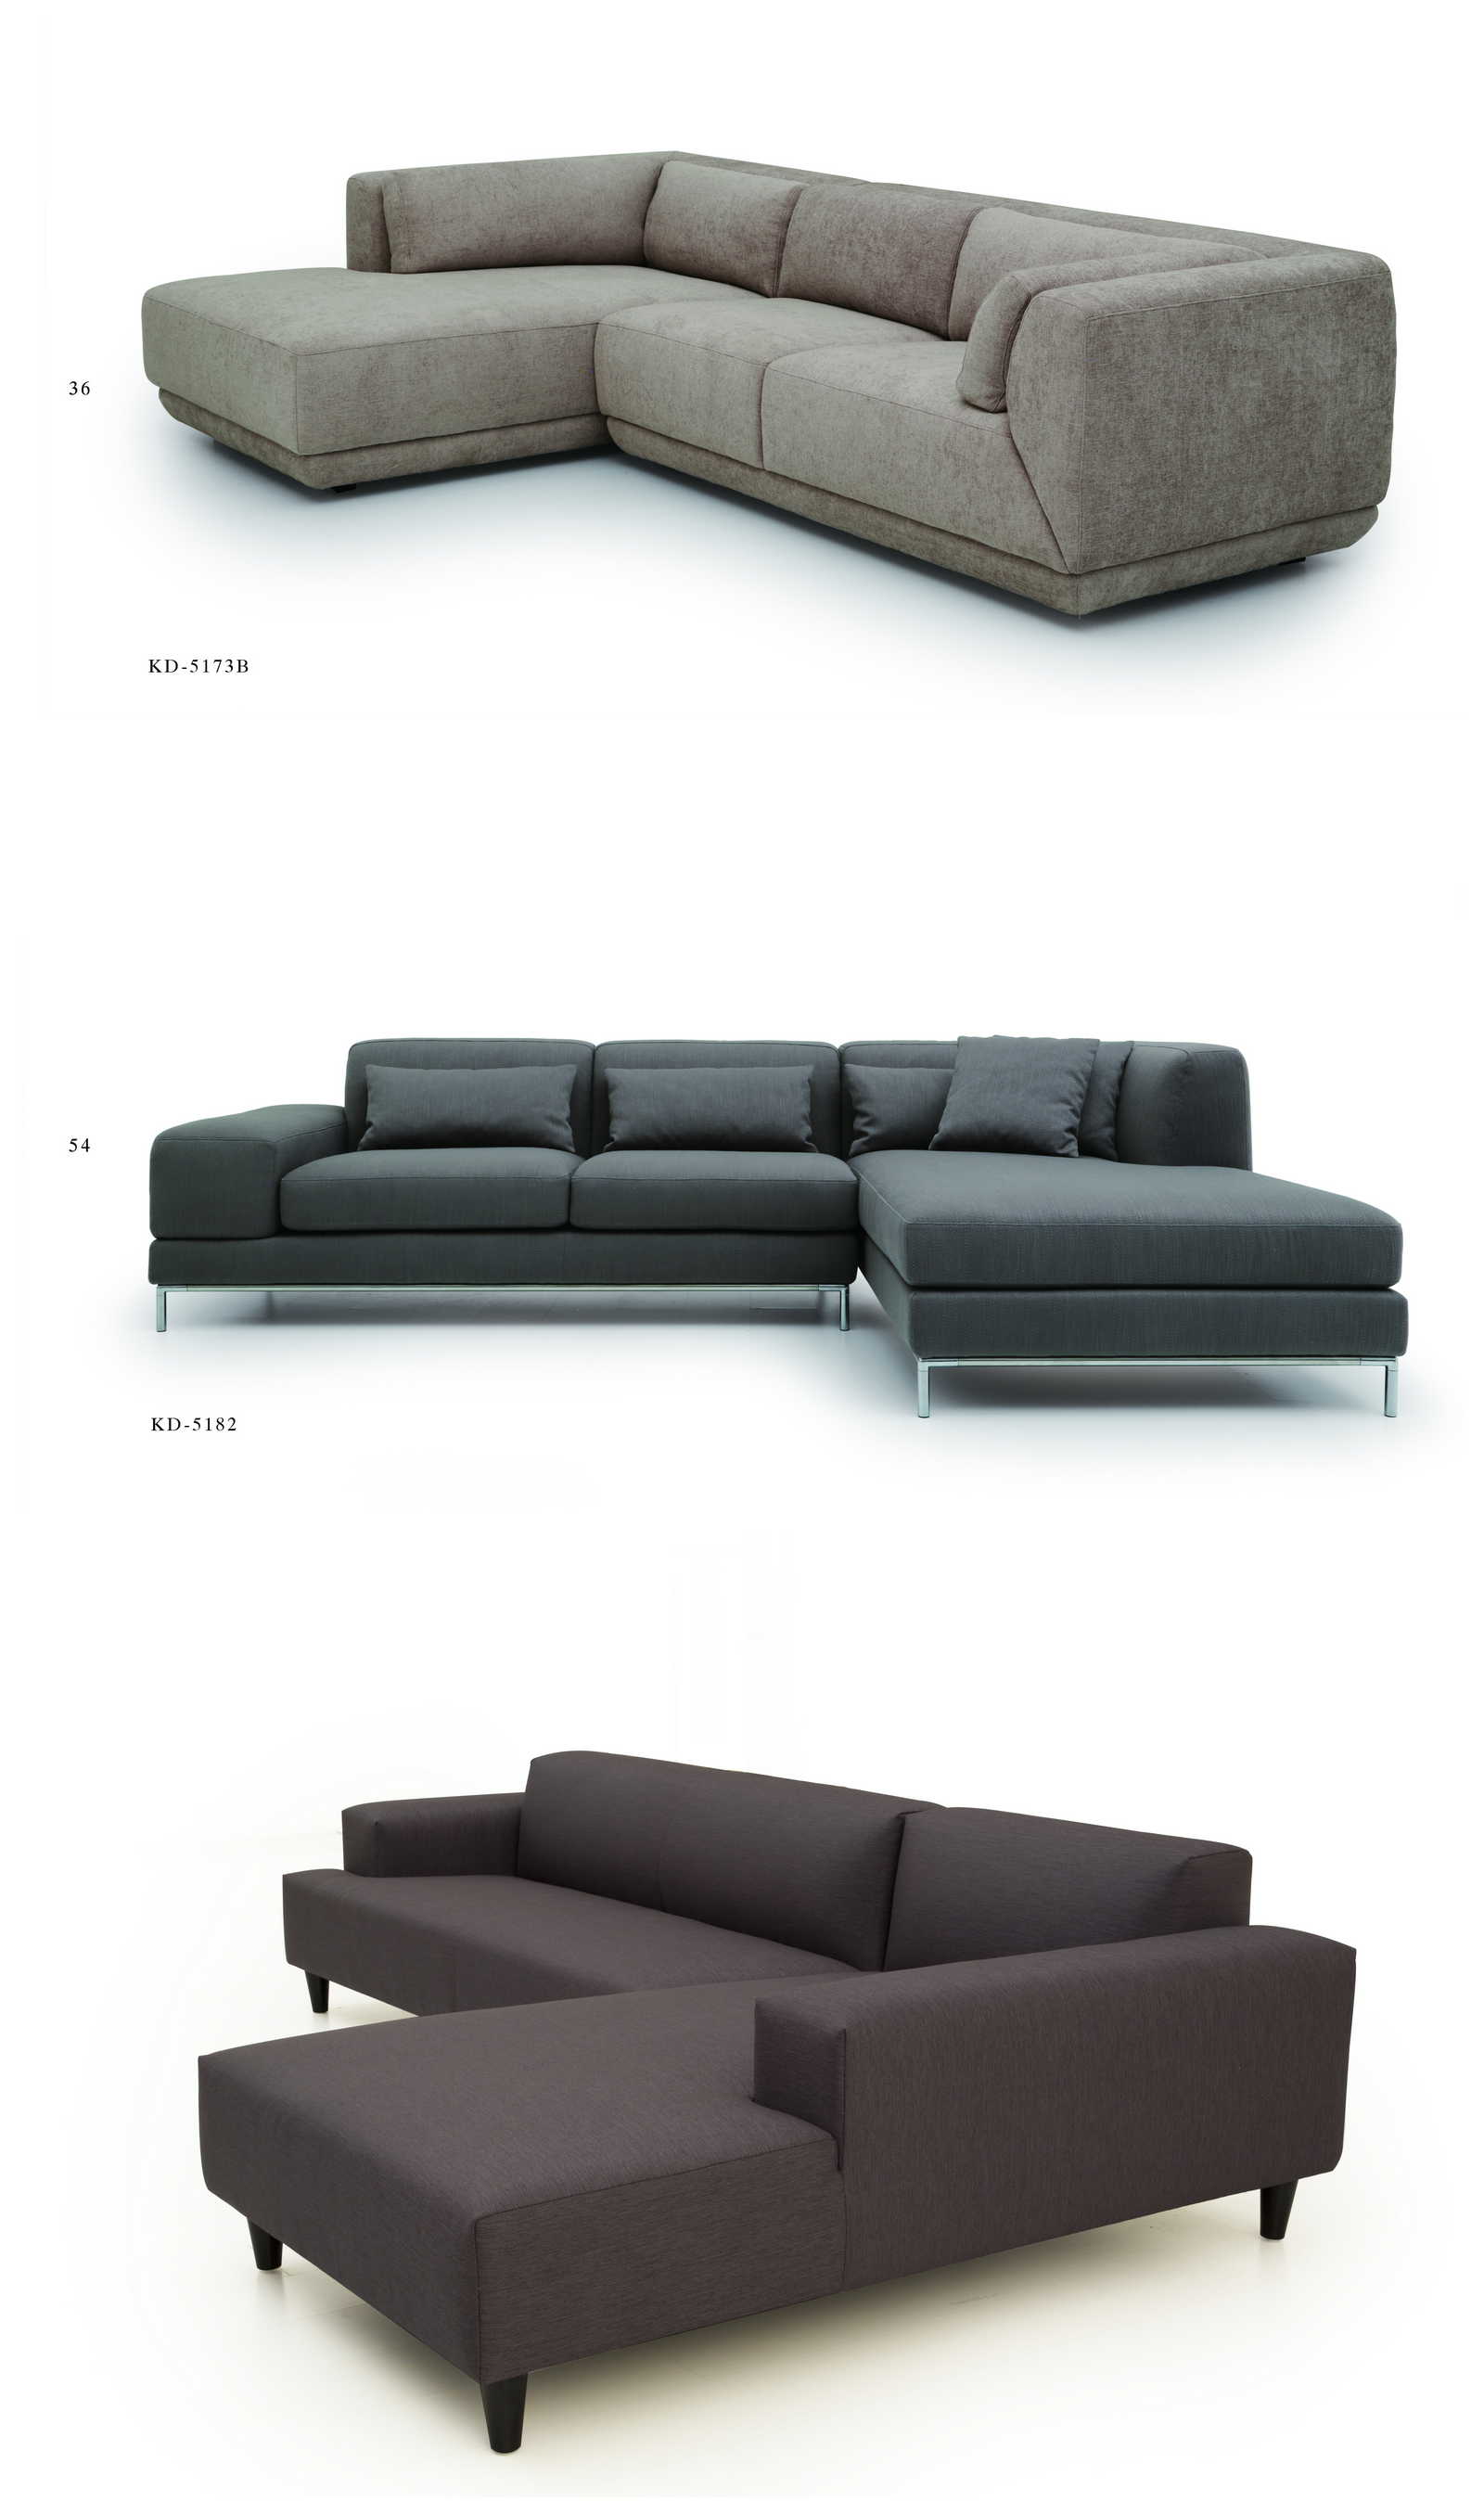 New Design Modern Sofa Set Sofaset Sofa Cocheen Modernsofa Cocheendesign Livingroomsofa Furniture Newdesign Sectio With Images Modern Sofa Set Sofa Frame Furniture